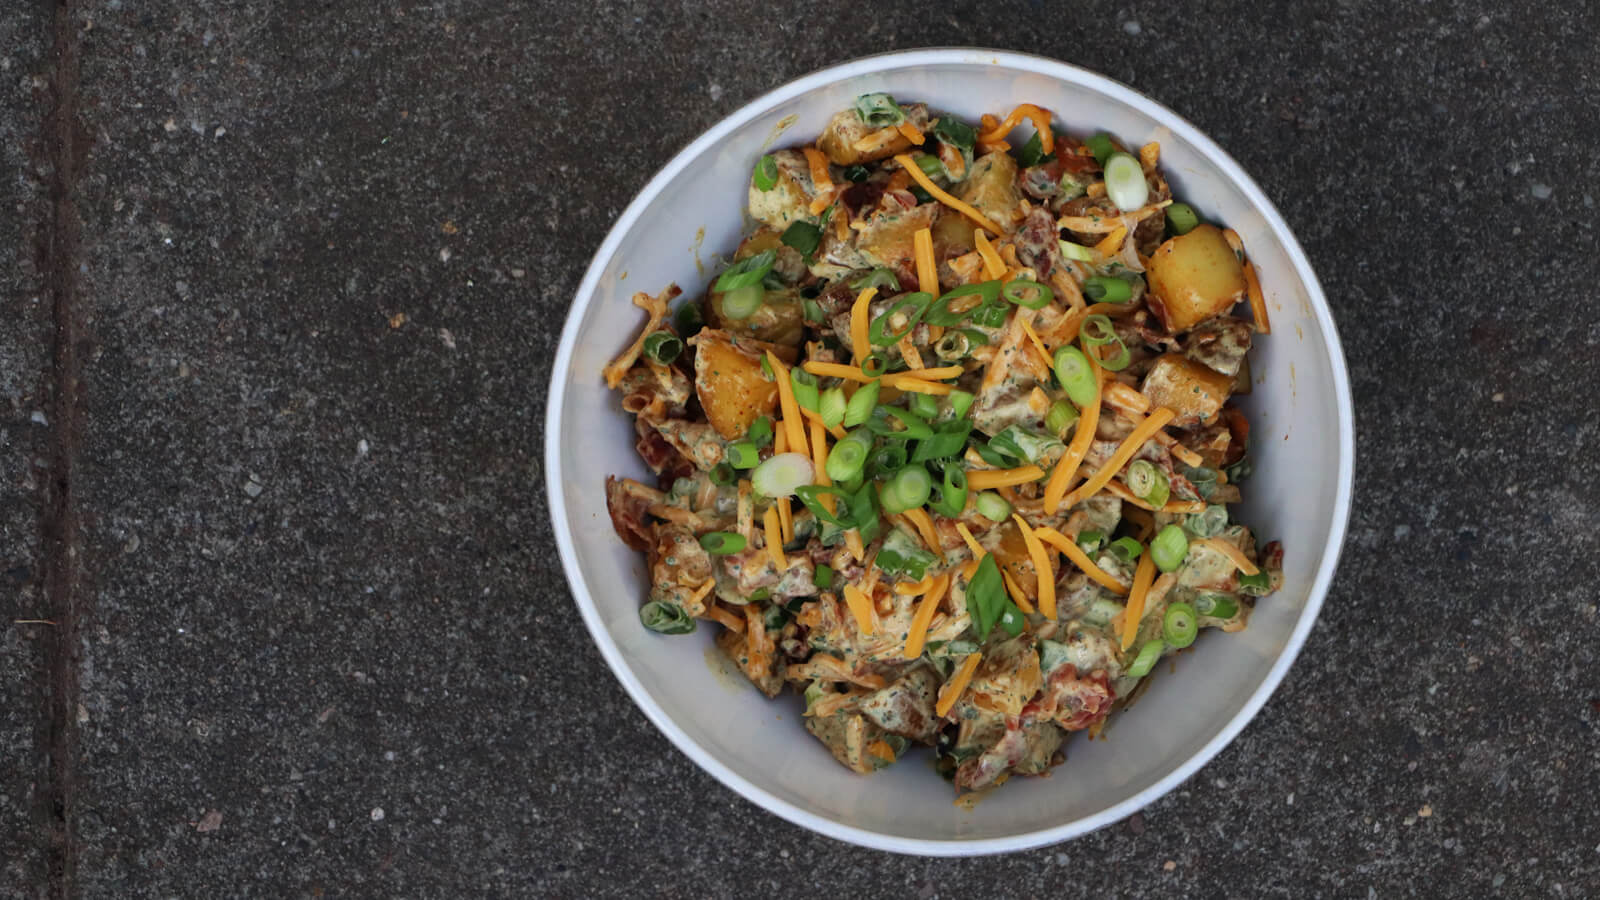 Bacon & Cheddar Aardappelsalade